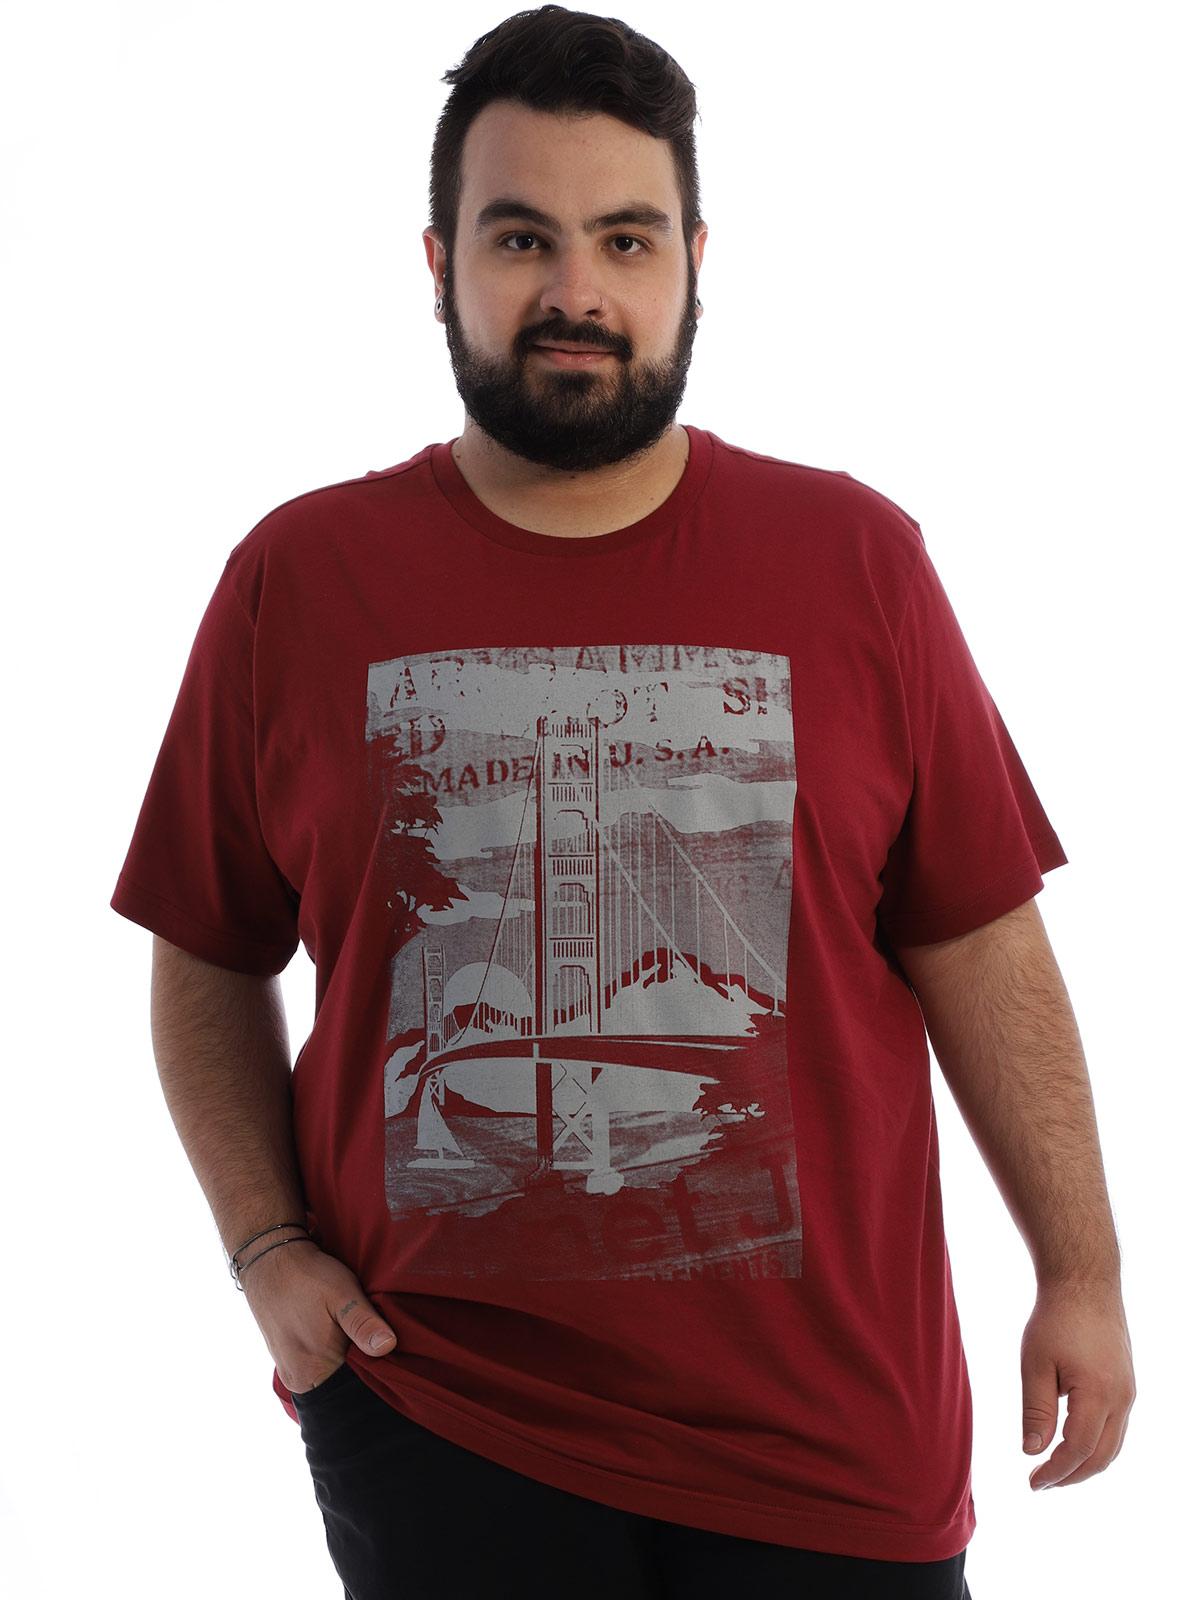 Camiseta Plus Size Masculina Algodão Manga Curta Ponte Bordo